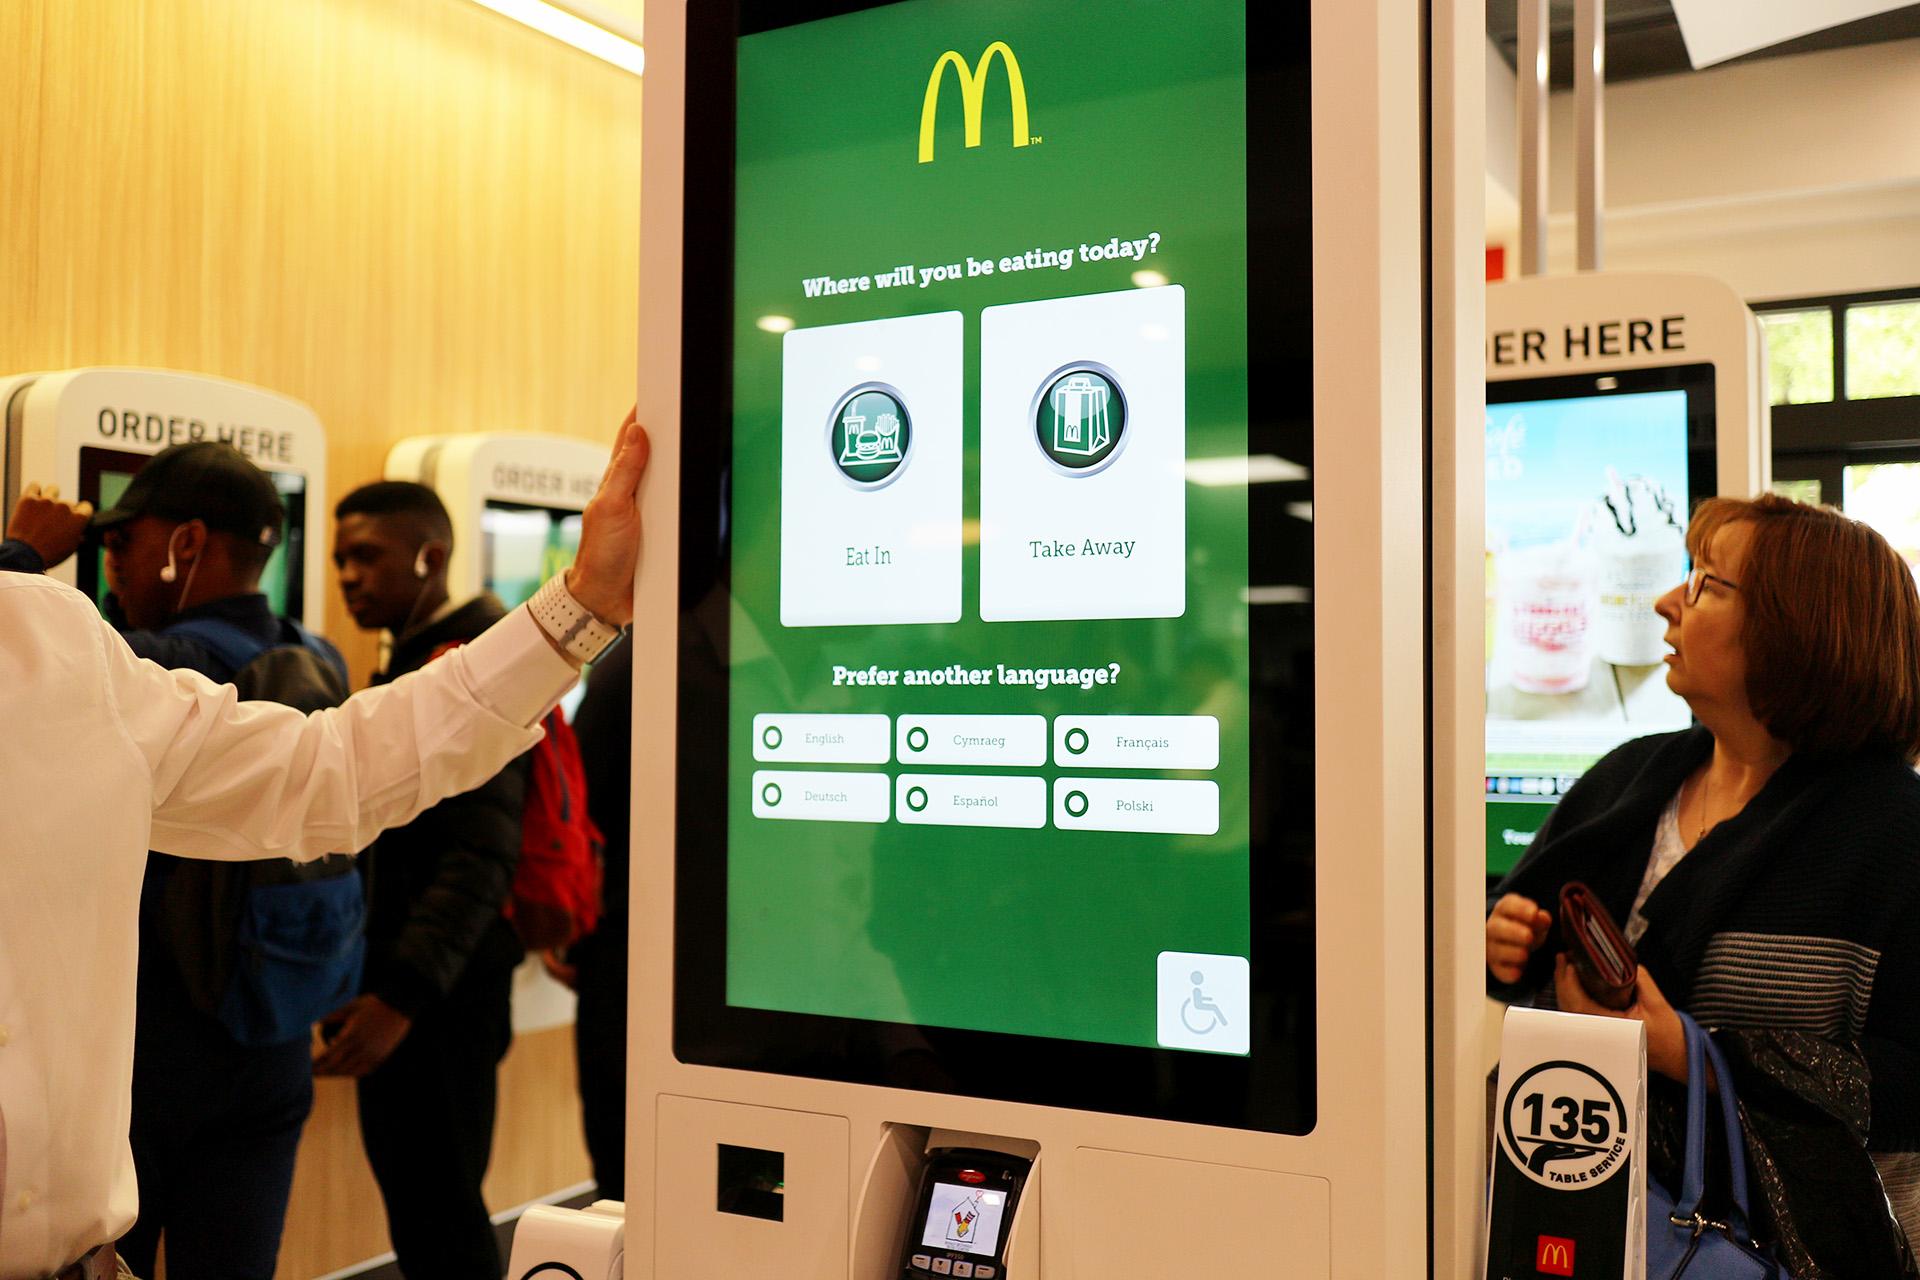 Your New McDonald's #YourNewMcDonalds